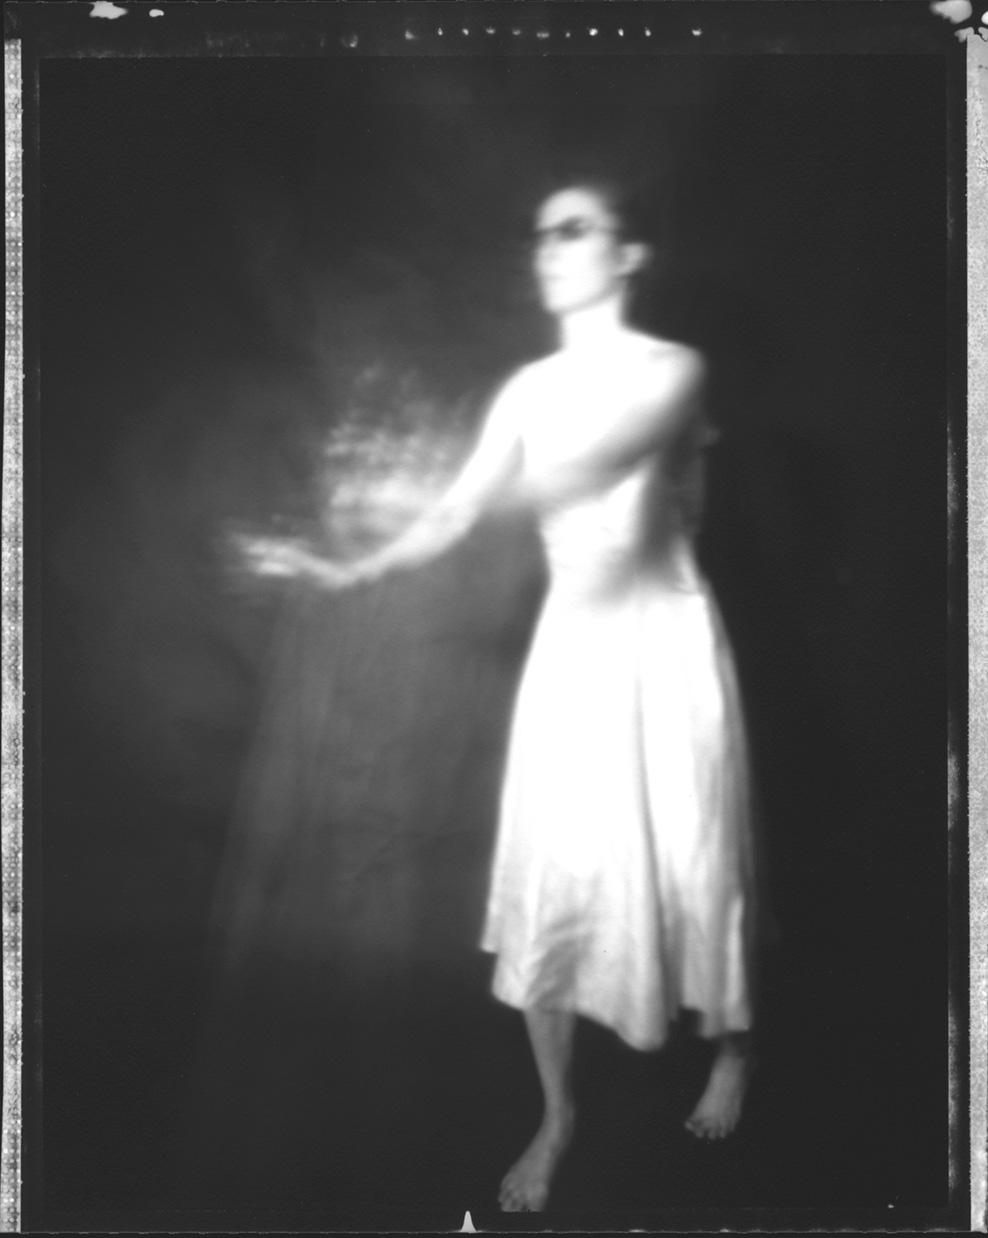 Self Portrait #42A, 2001